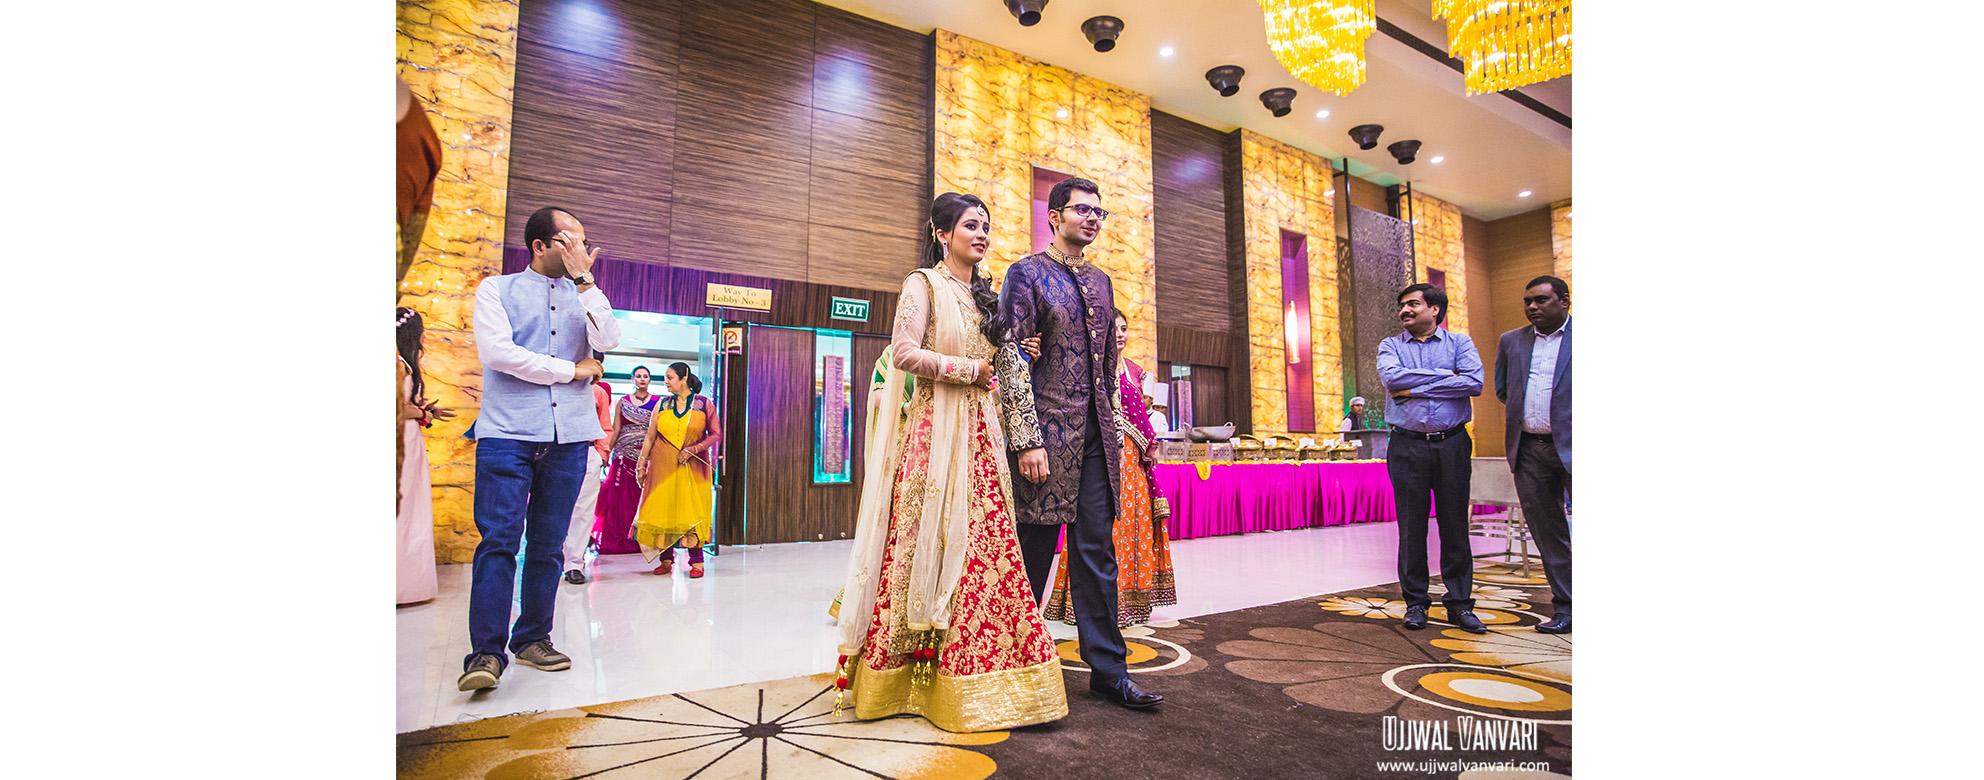 Candid Photographer in Lucknow | Mannat & Rishabh Wedding | Candid Wedding Photography